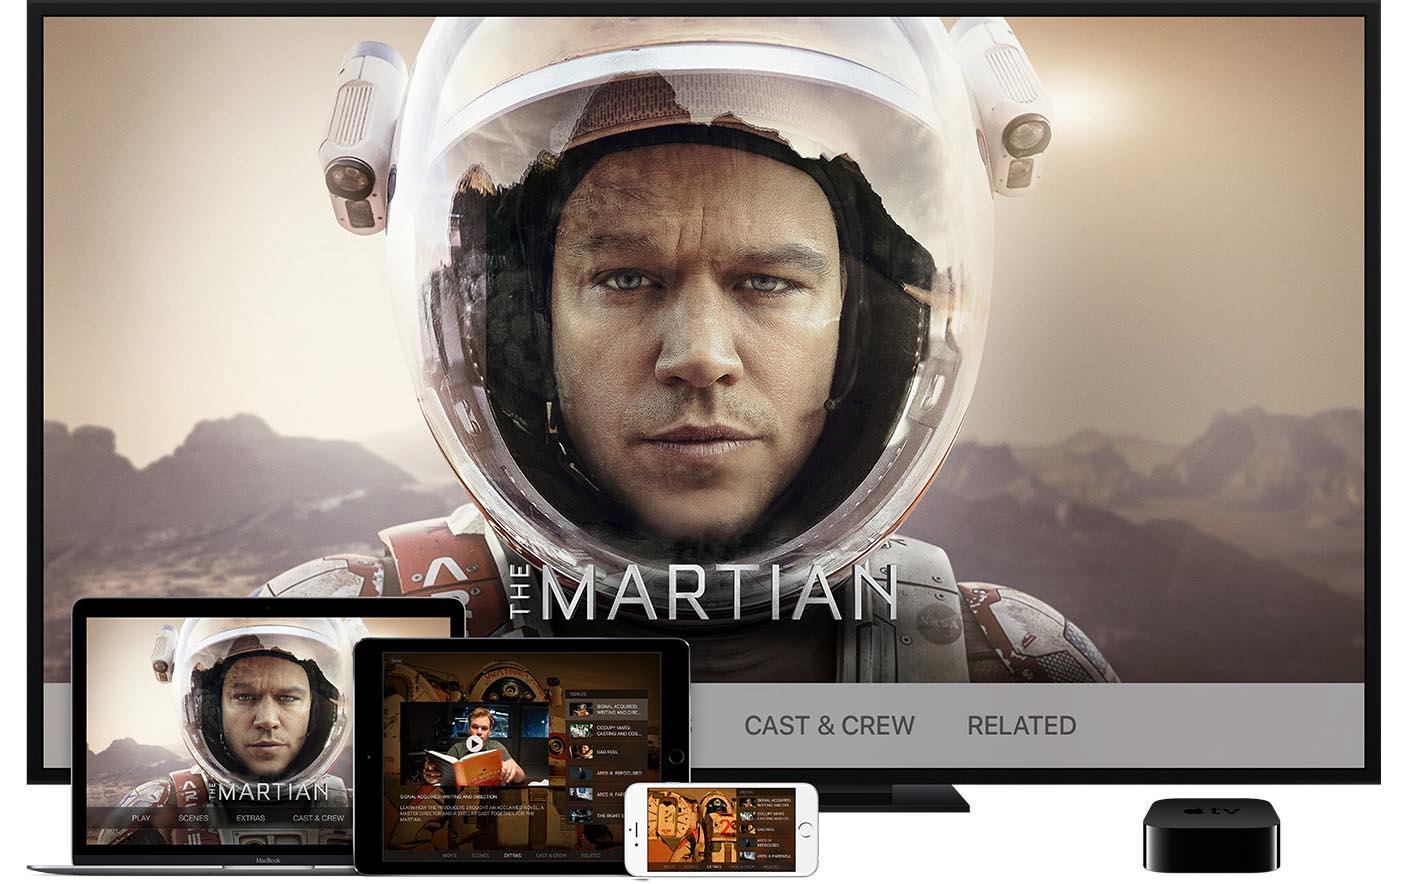 Apple TV films